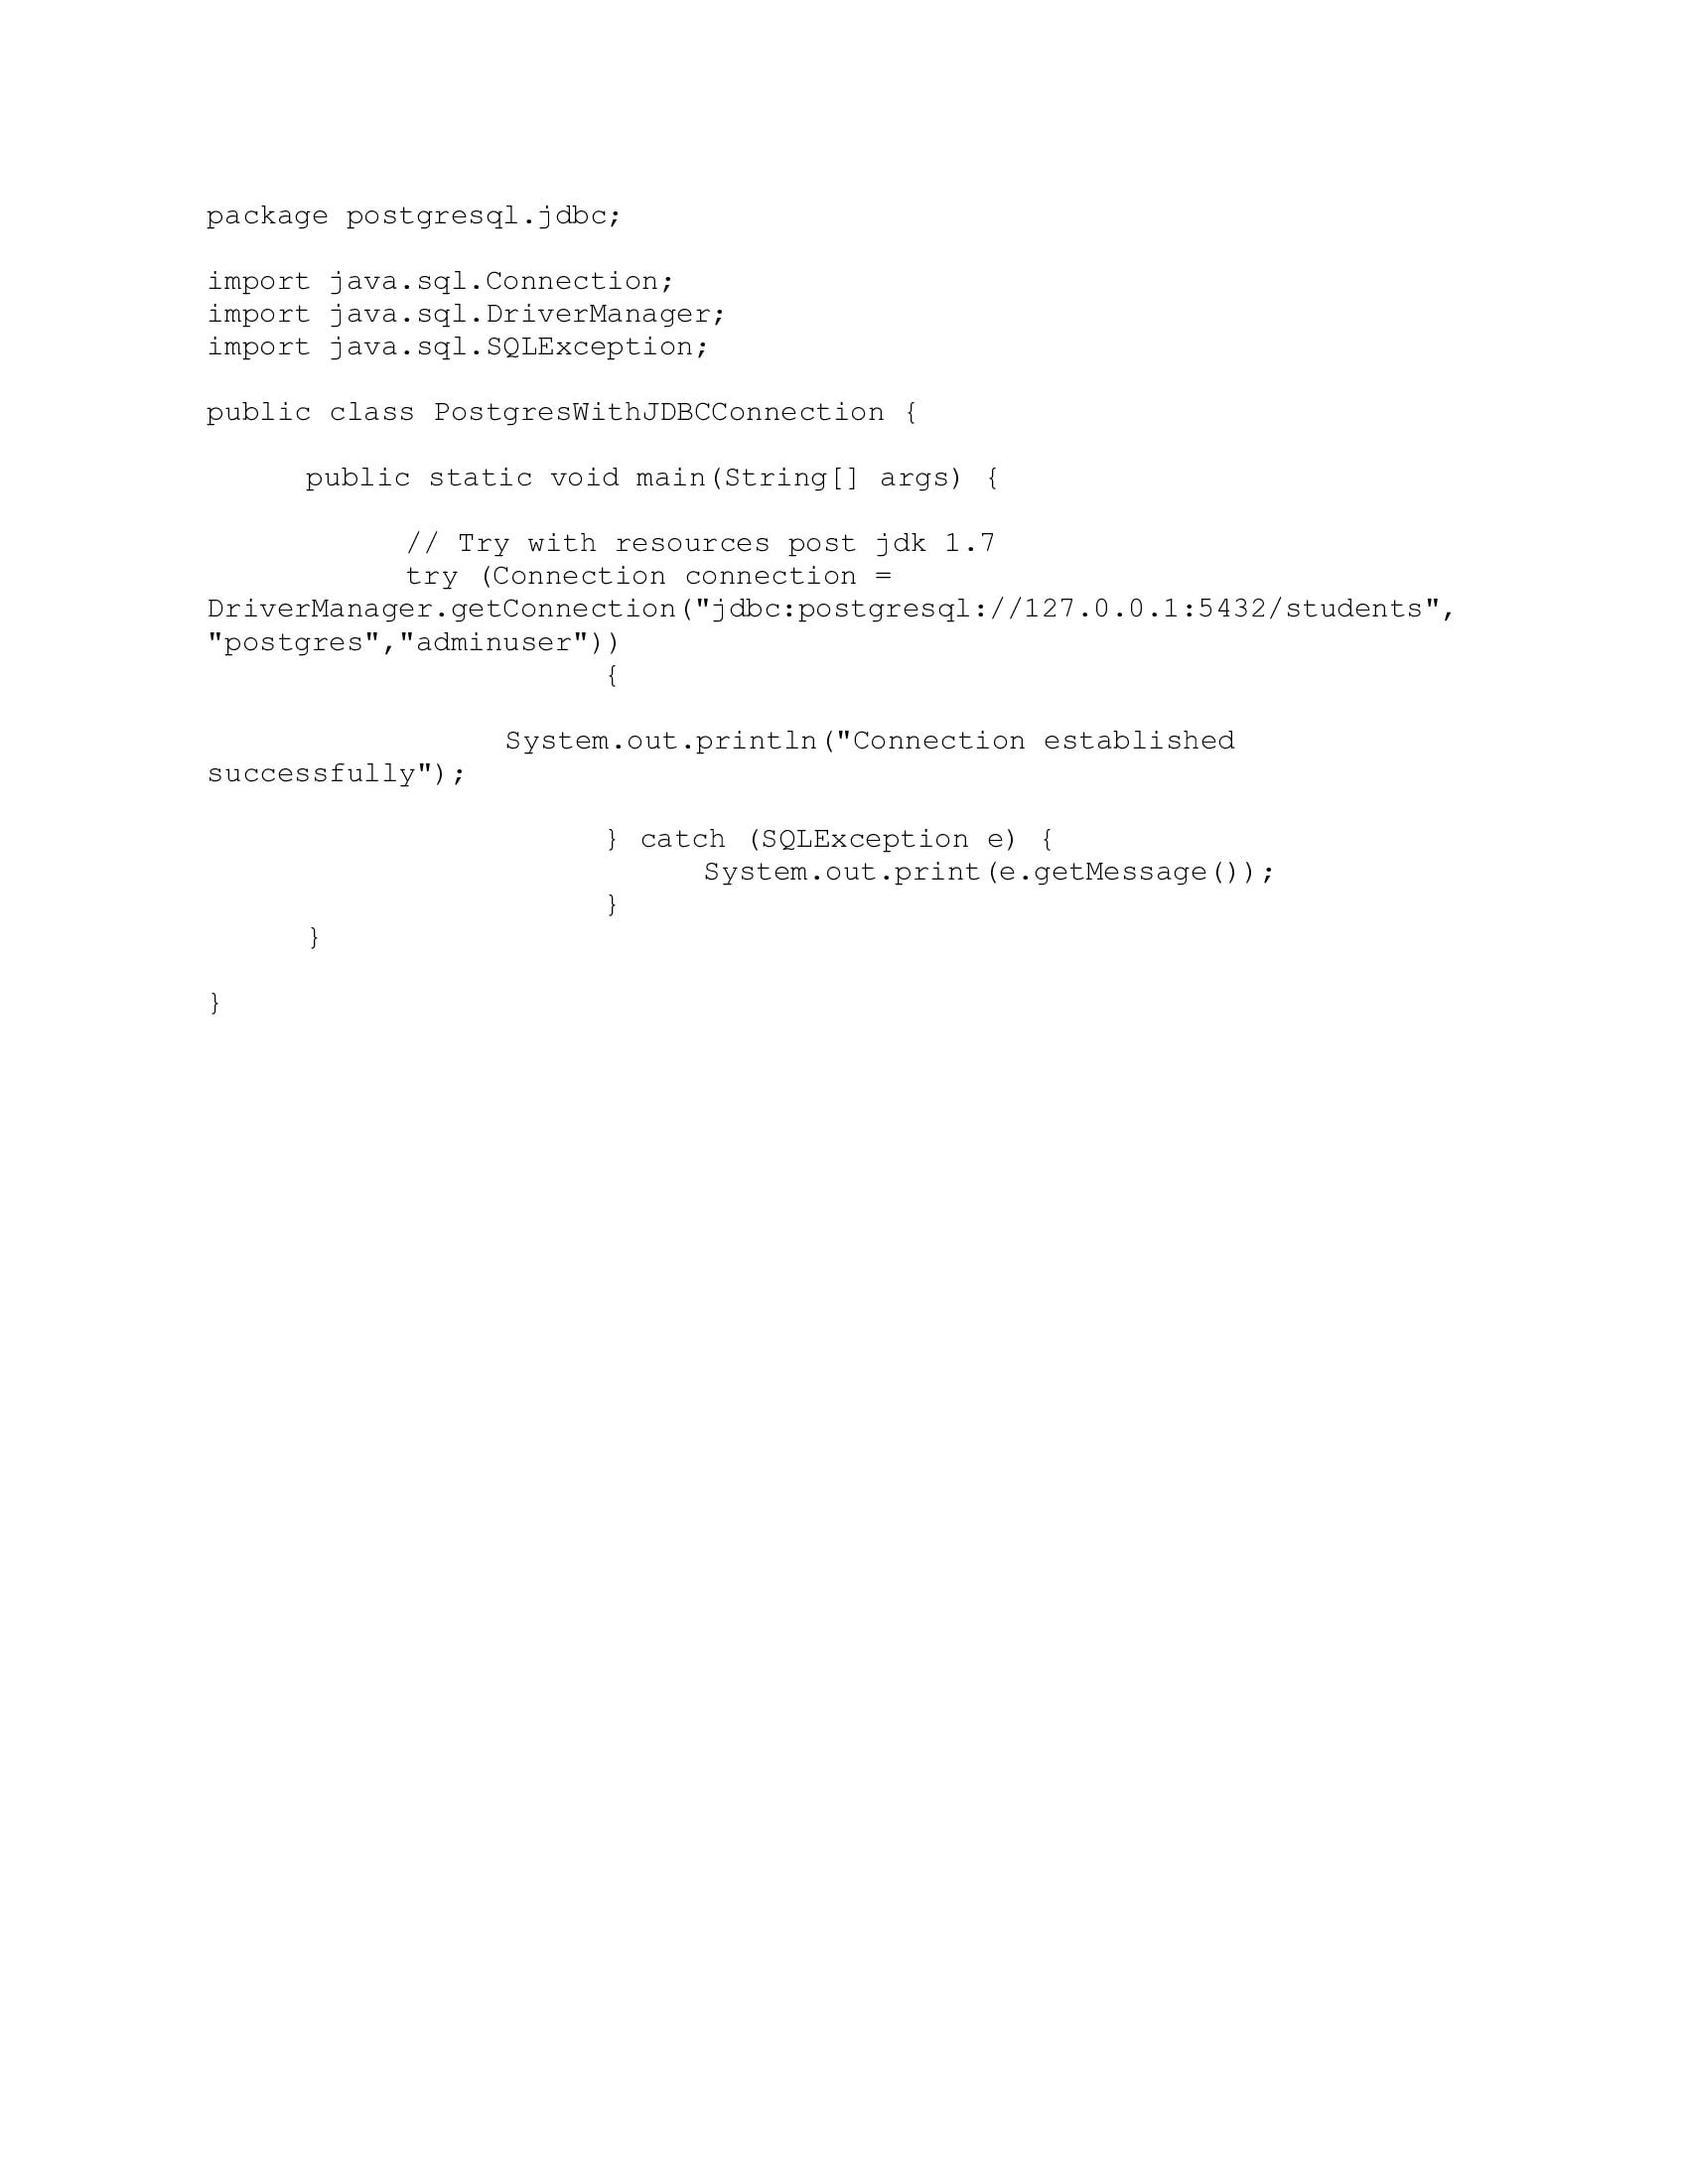 JDBC-Connection